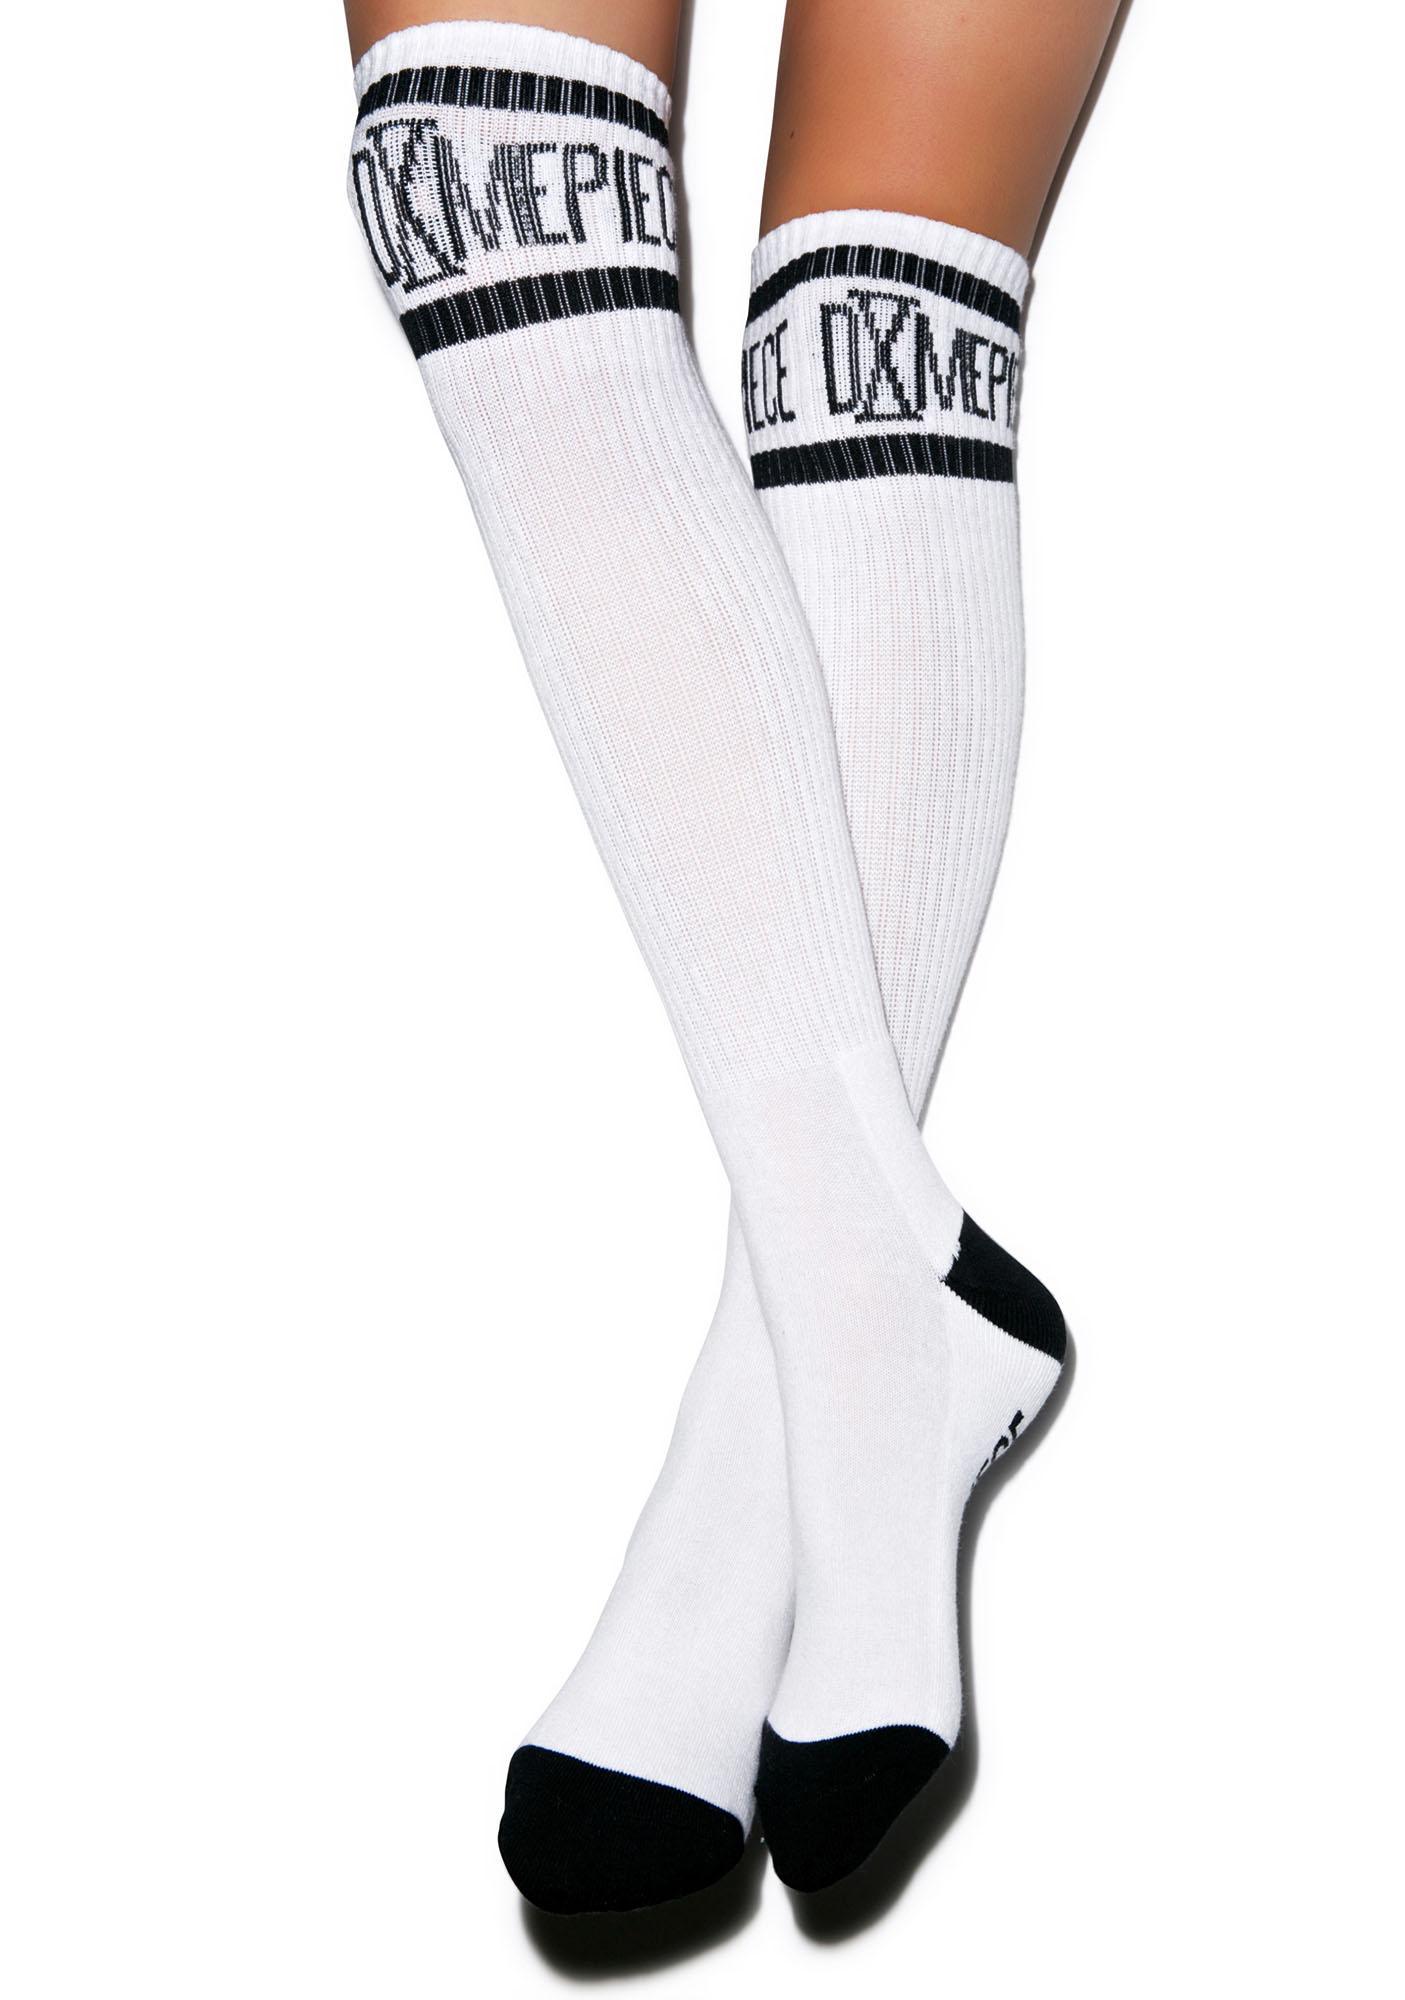 Dimepiece Athletic Logo Knee High Socks